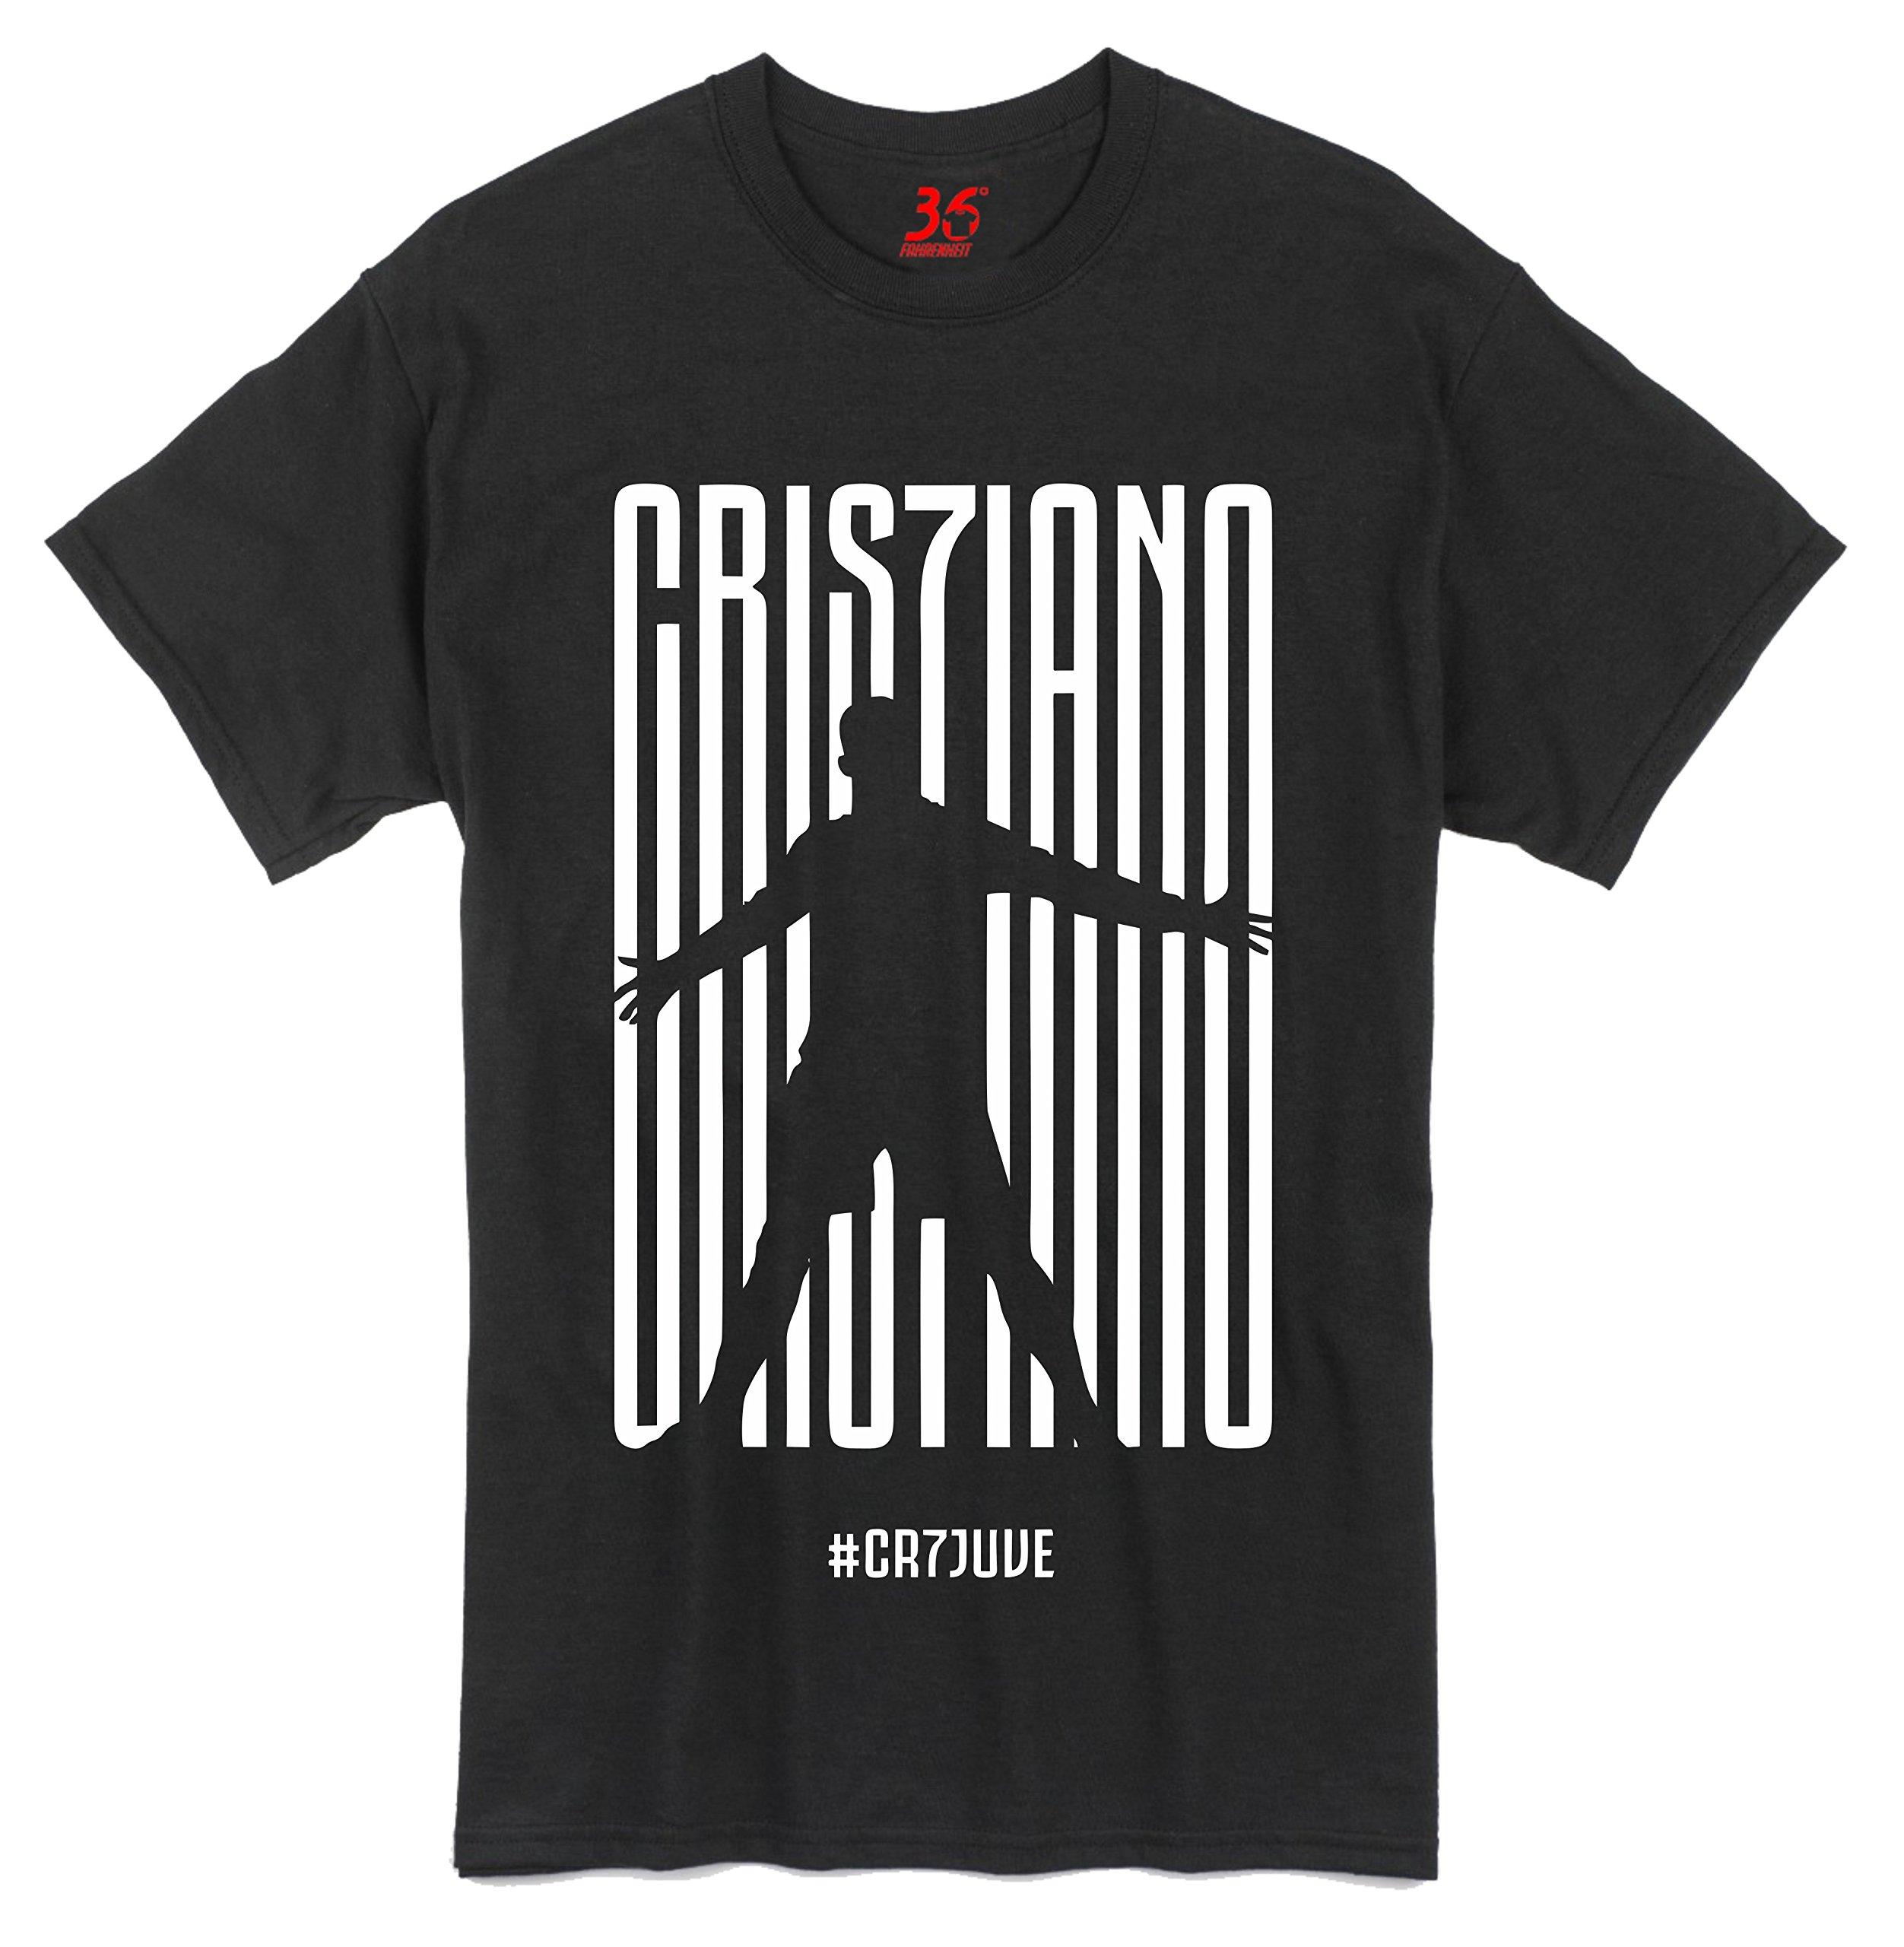 low priced 2706a 19d3d 36FAHRENHEIT Unisex Cotton Cristiano Ronaldo CR7 Juve Juventus T-Shirt